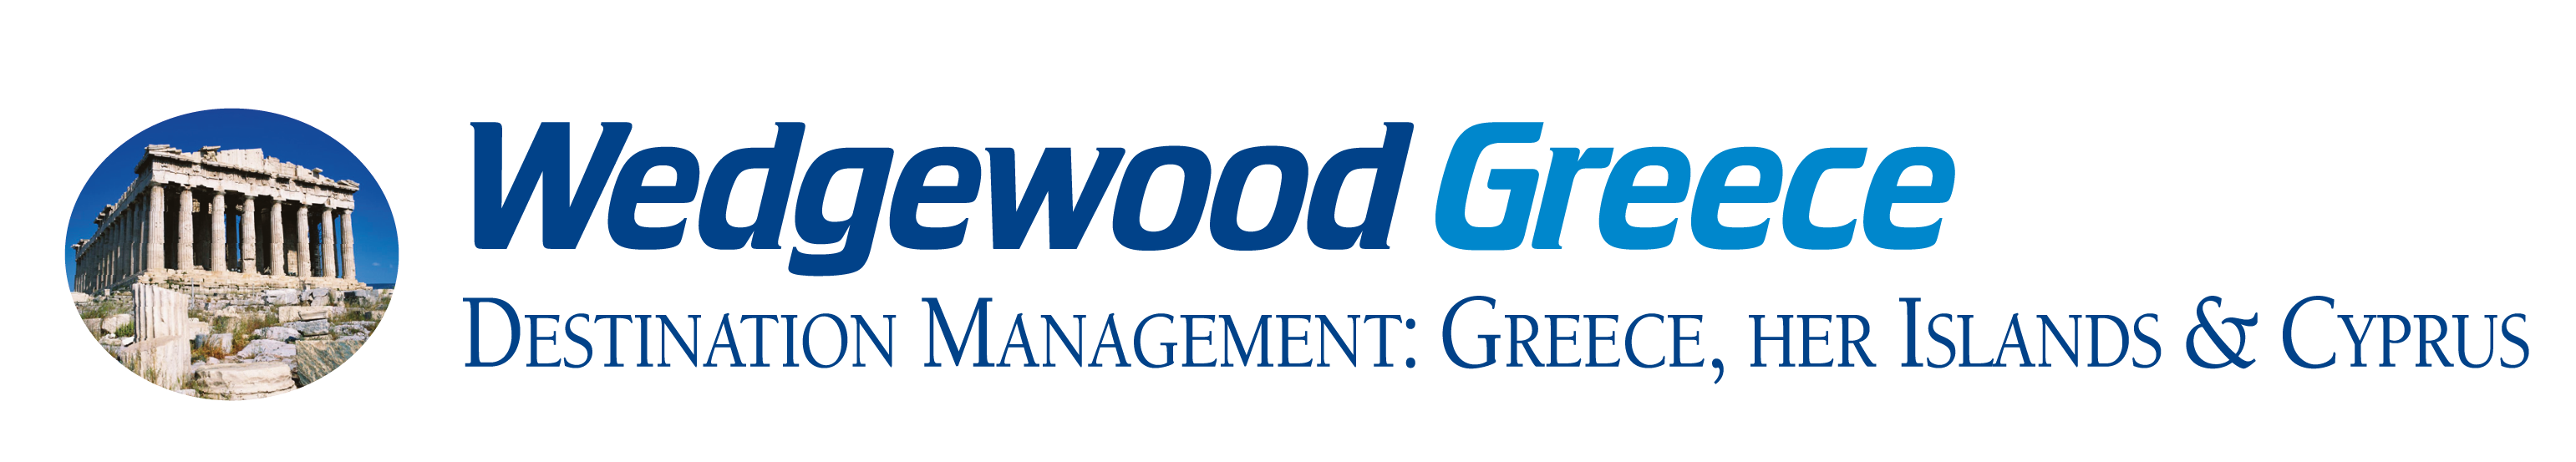 Wedgewood Greece-01